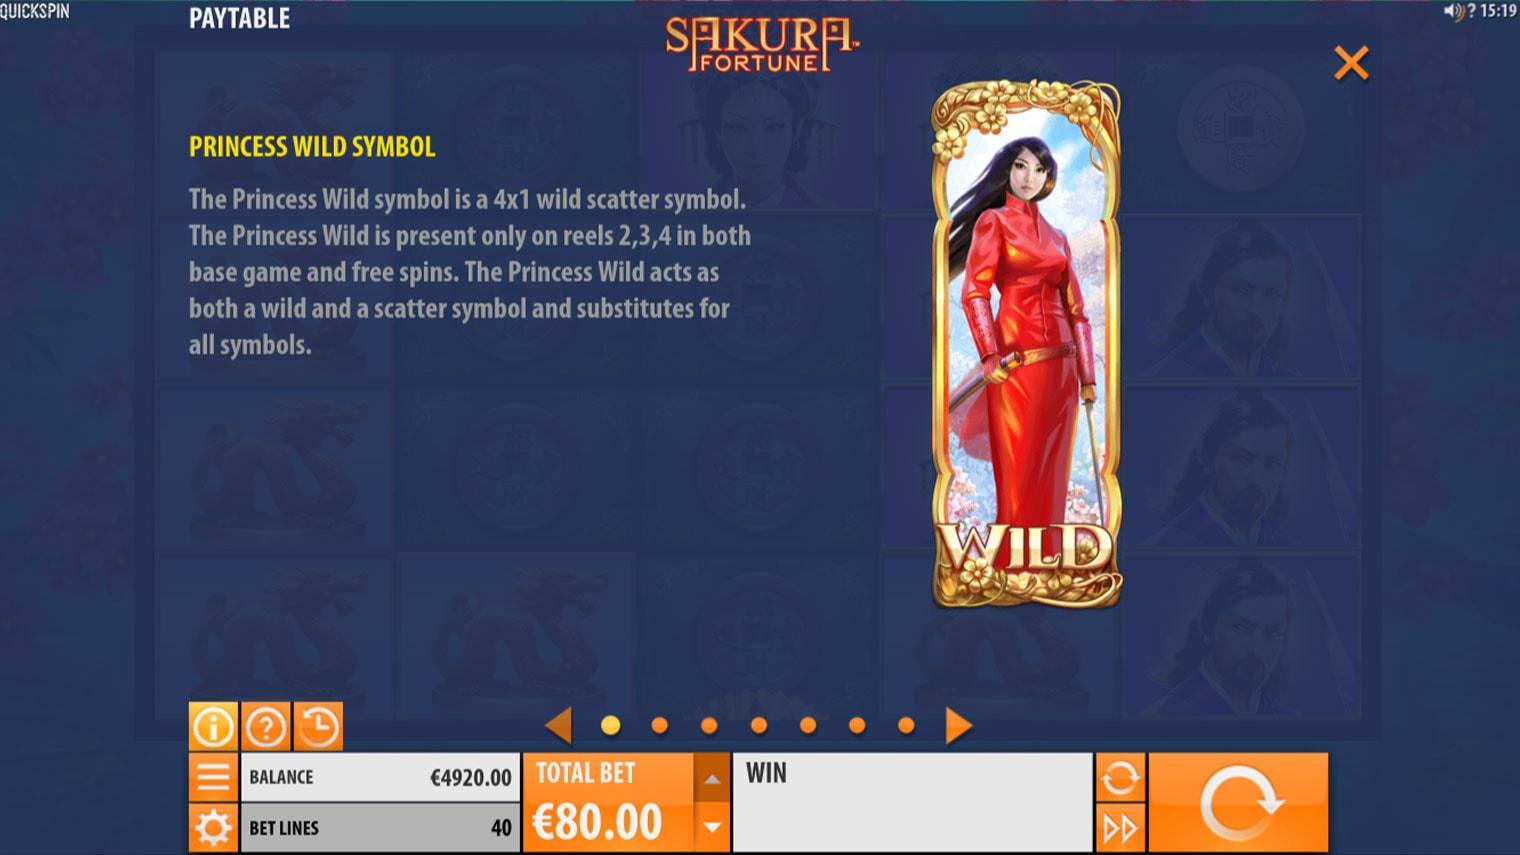 Sakura Fortune Slot Game Symbols and Winning Combinations